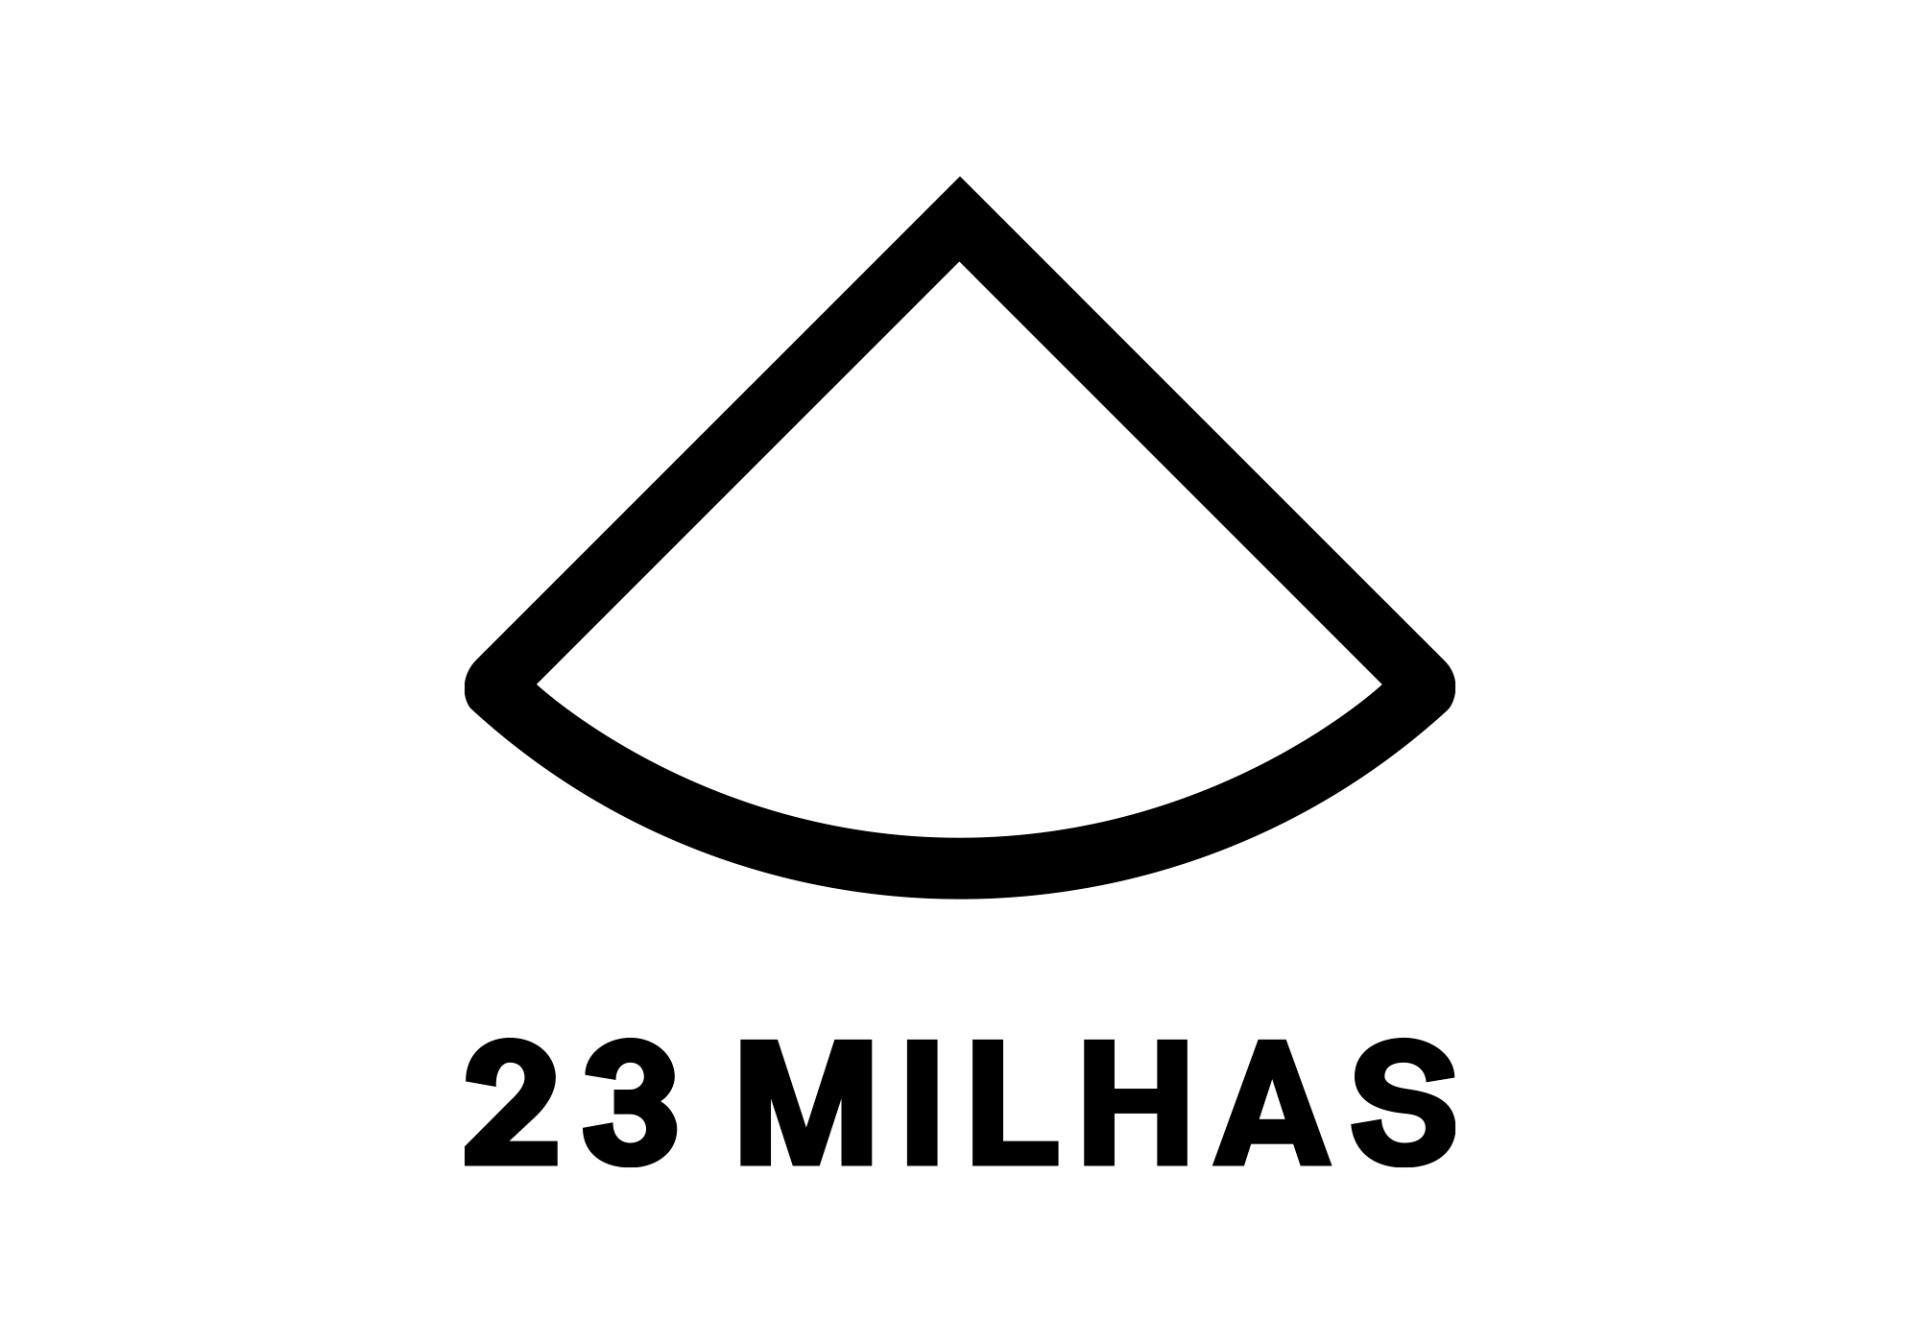 23 Milhas Image:1 23Milhas-01